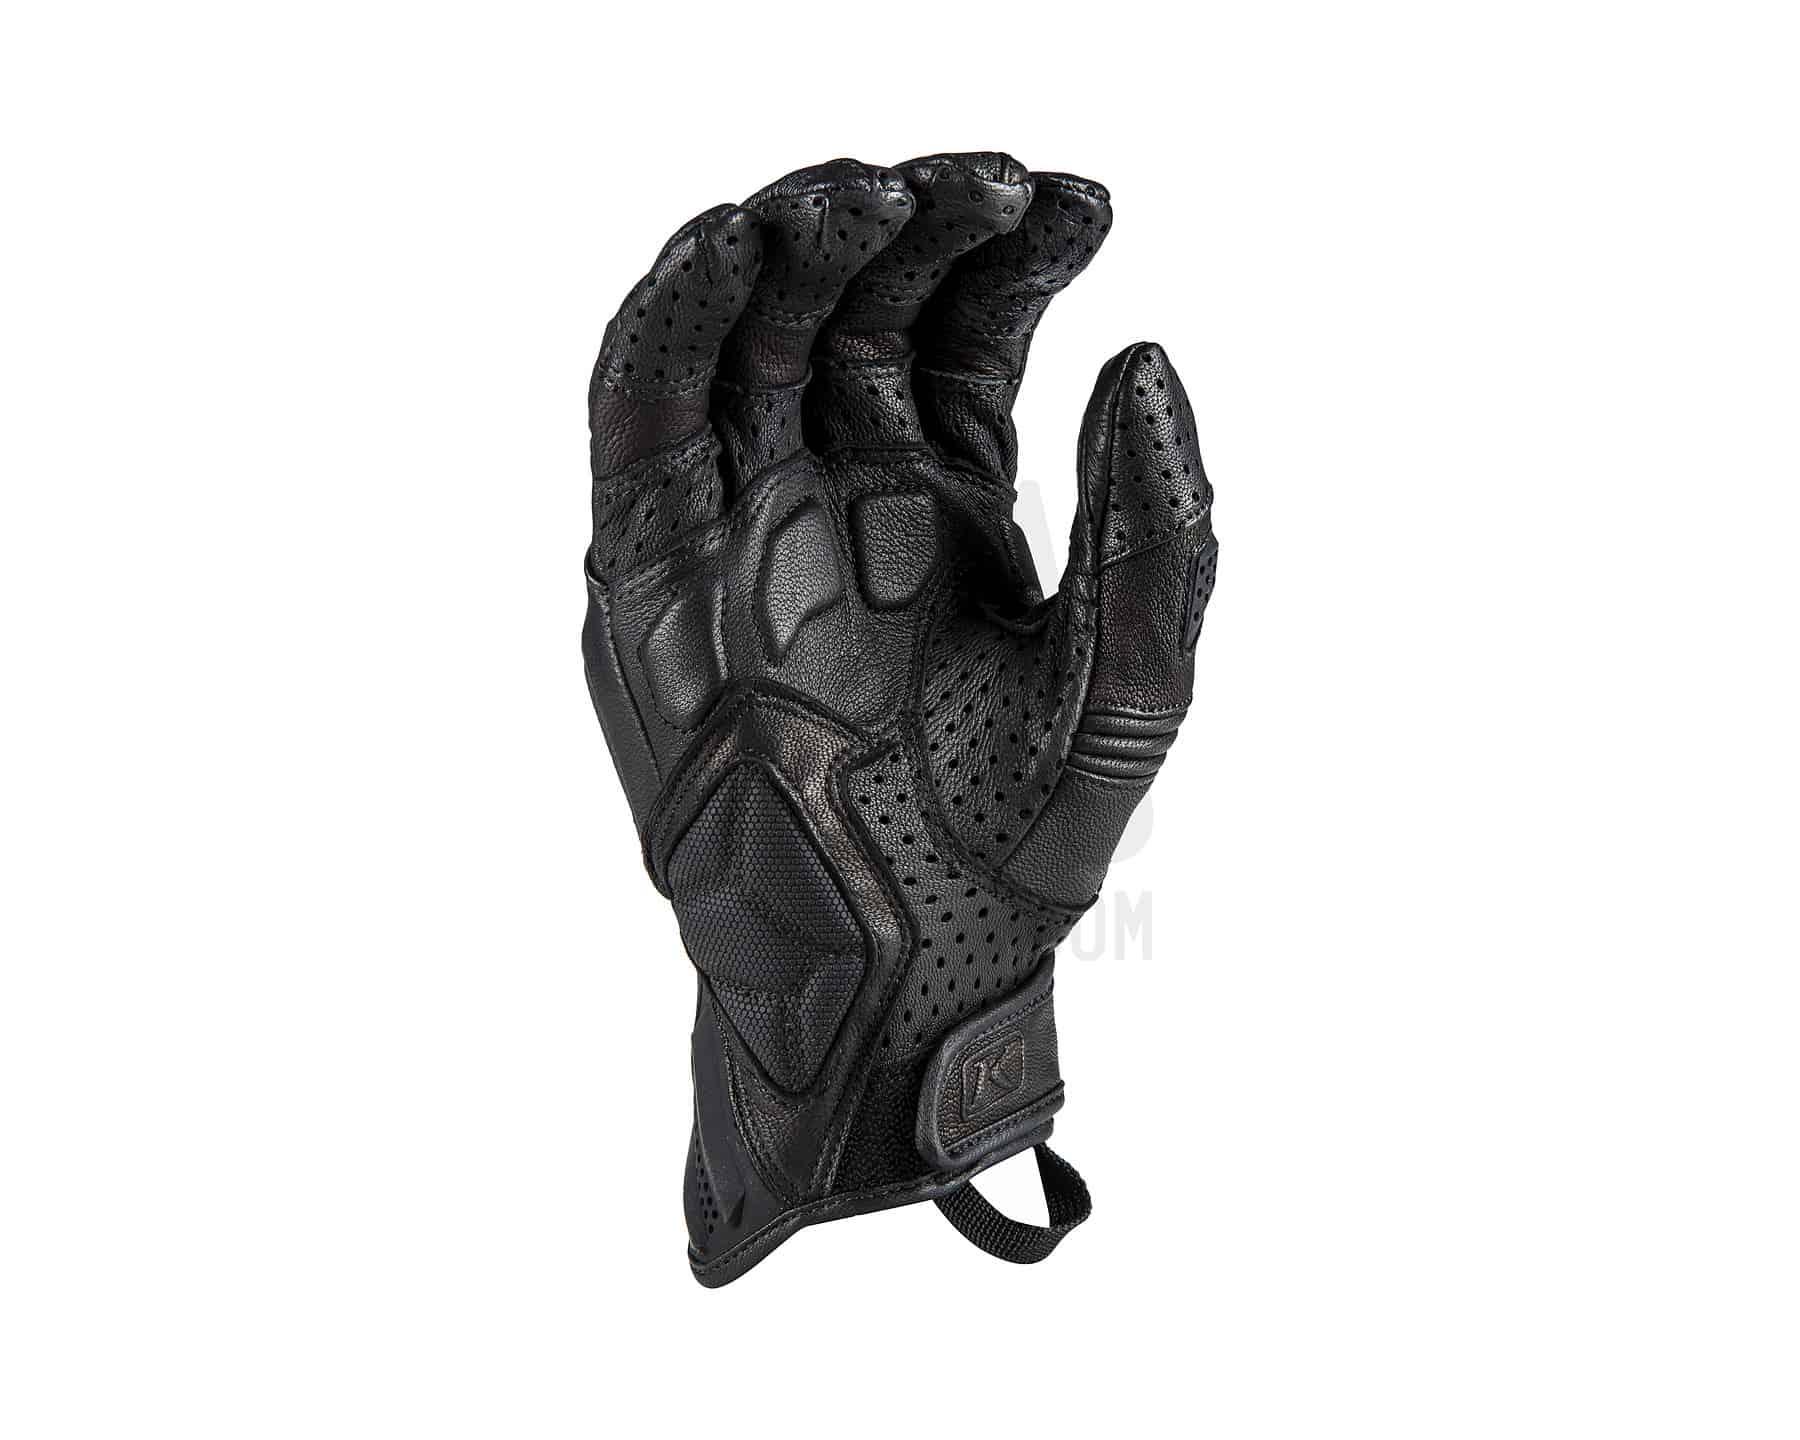 Badlands Aero Pro Short Glove_3924-000_Black_02